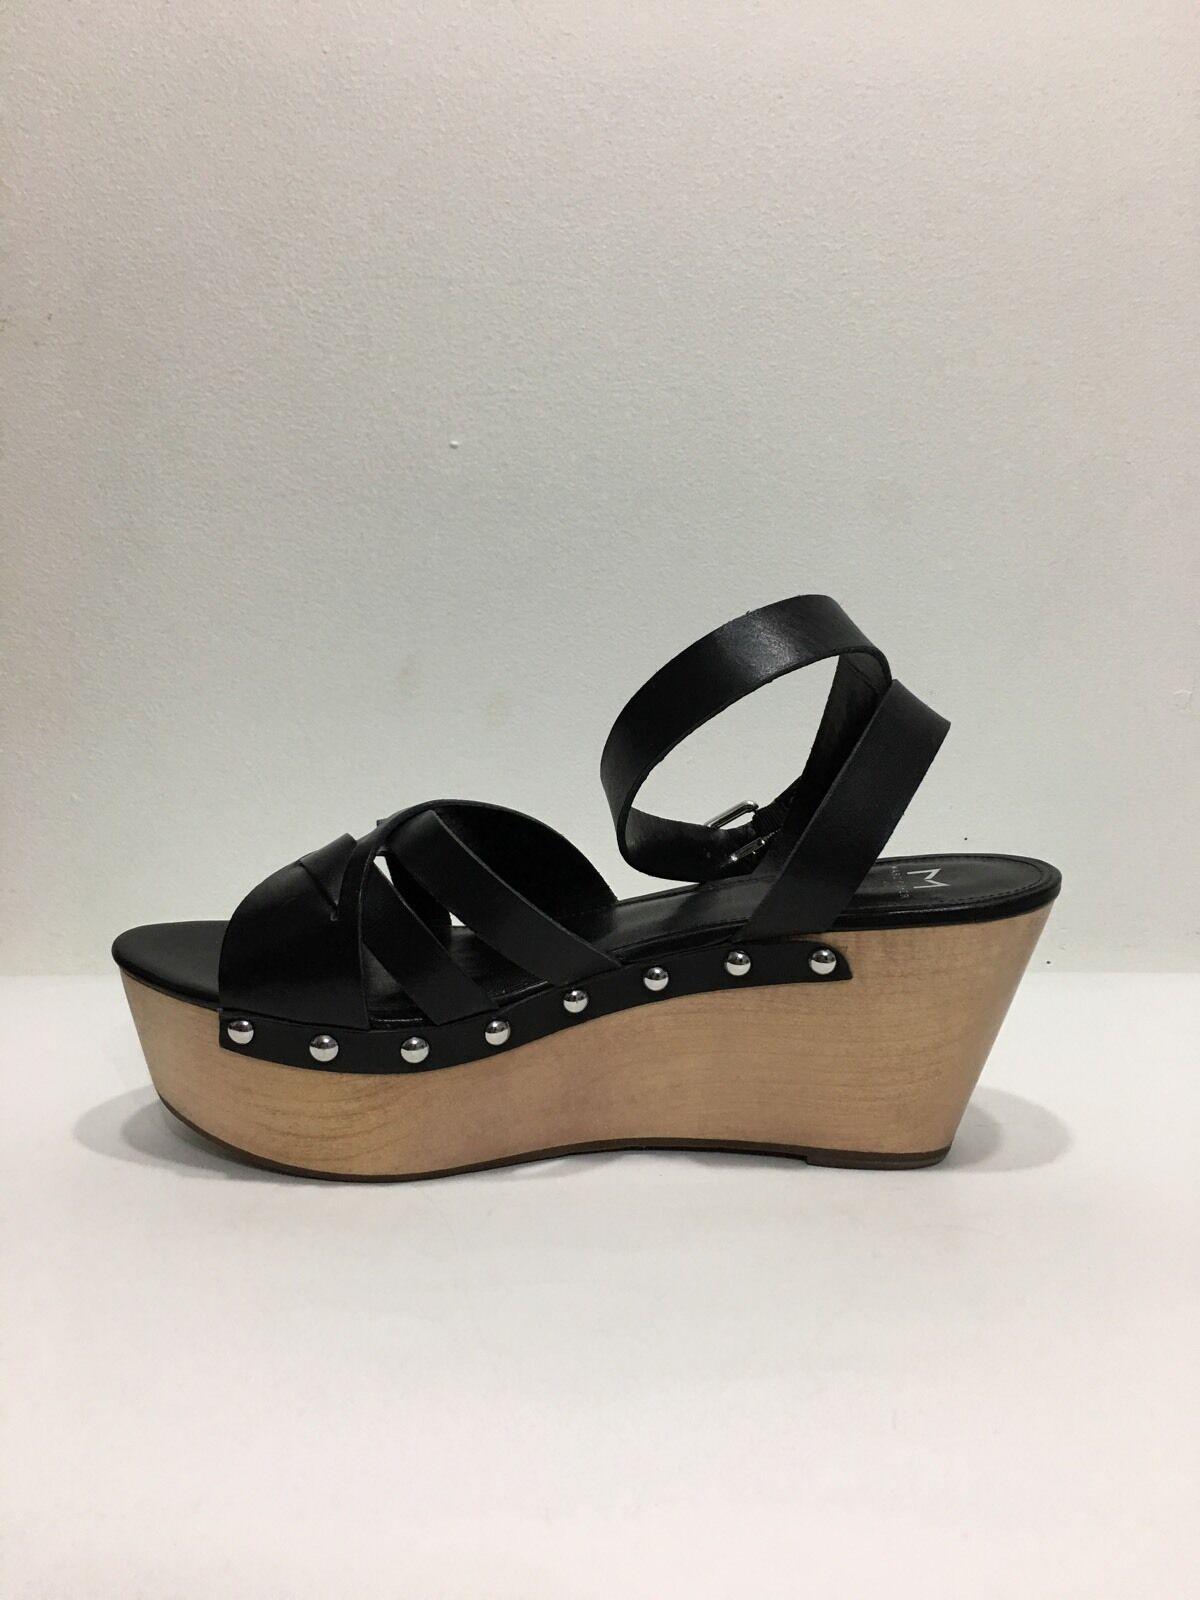 Nwt Marc Marc Marc Fisher  Black Leather Ankle Strap Platform Wooden Sandals Size 11 68879b